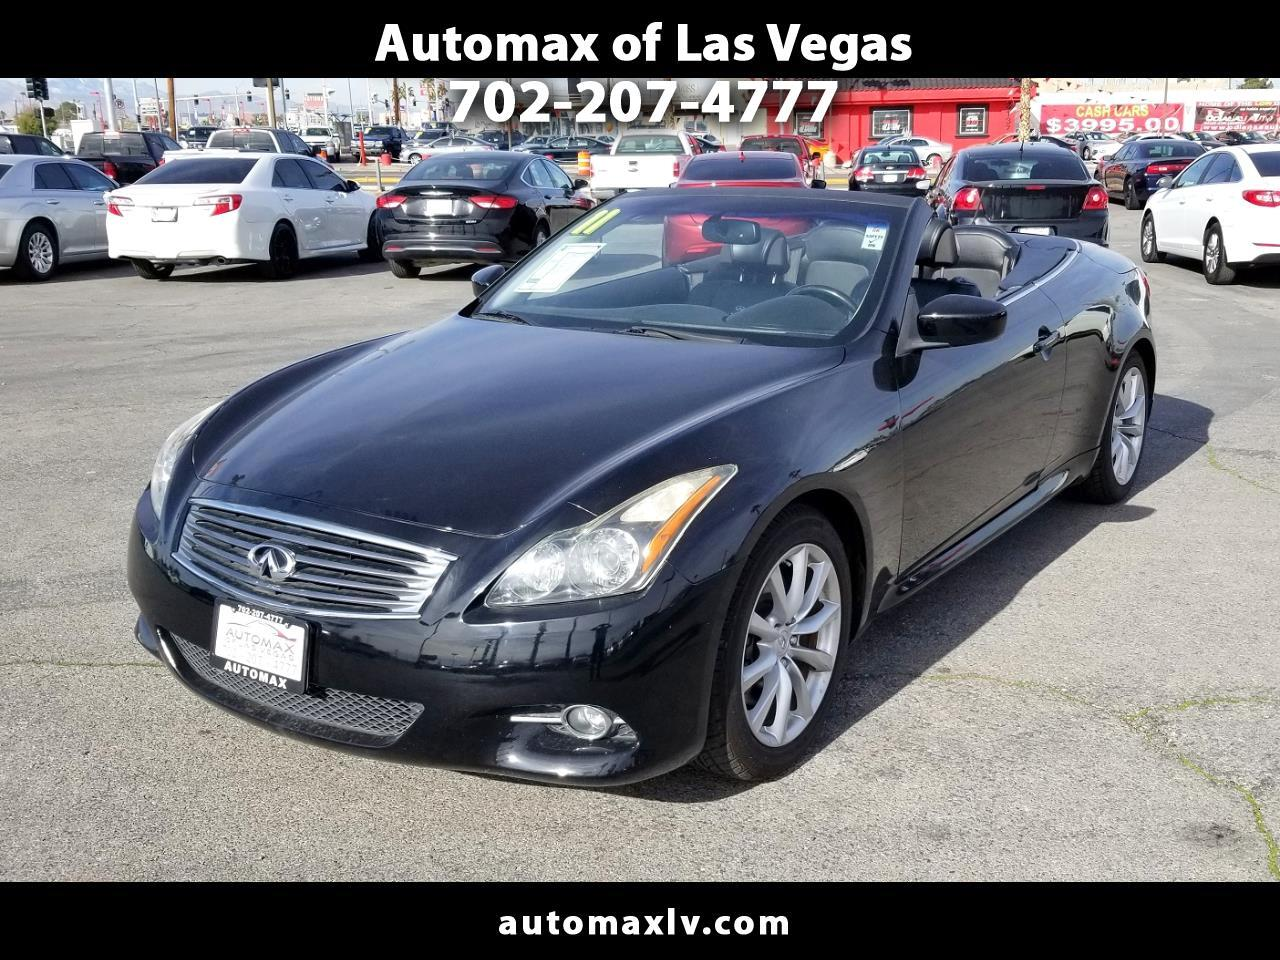 Used Cars For Sale Las Vegas